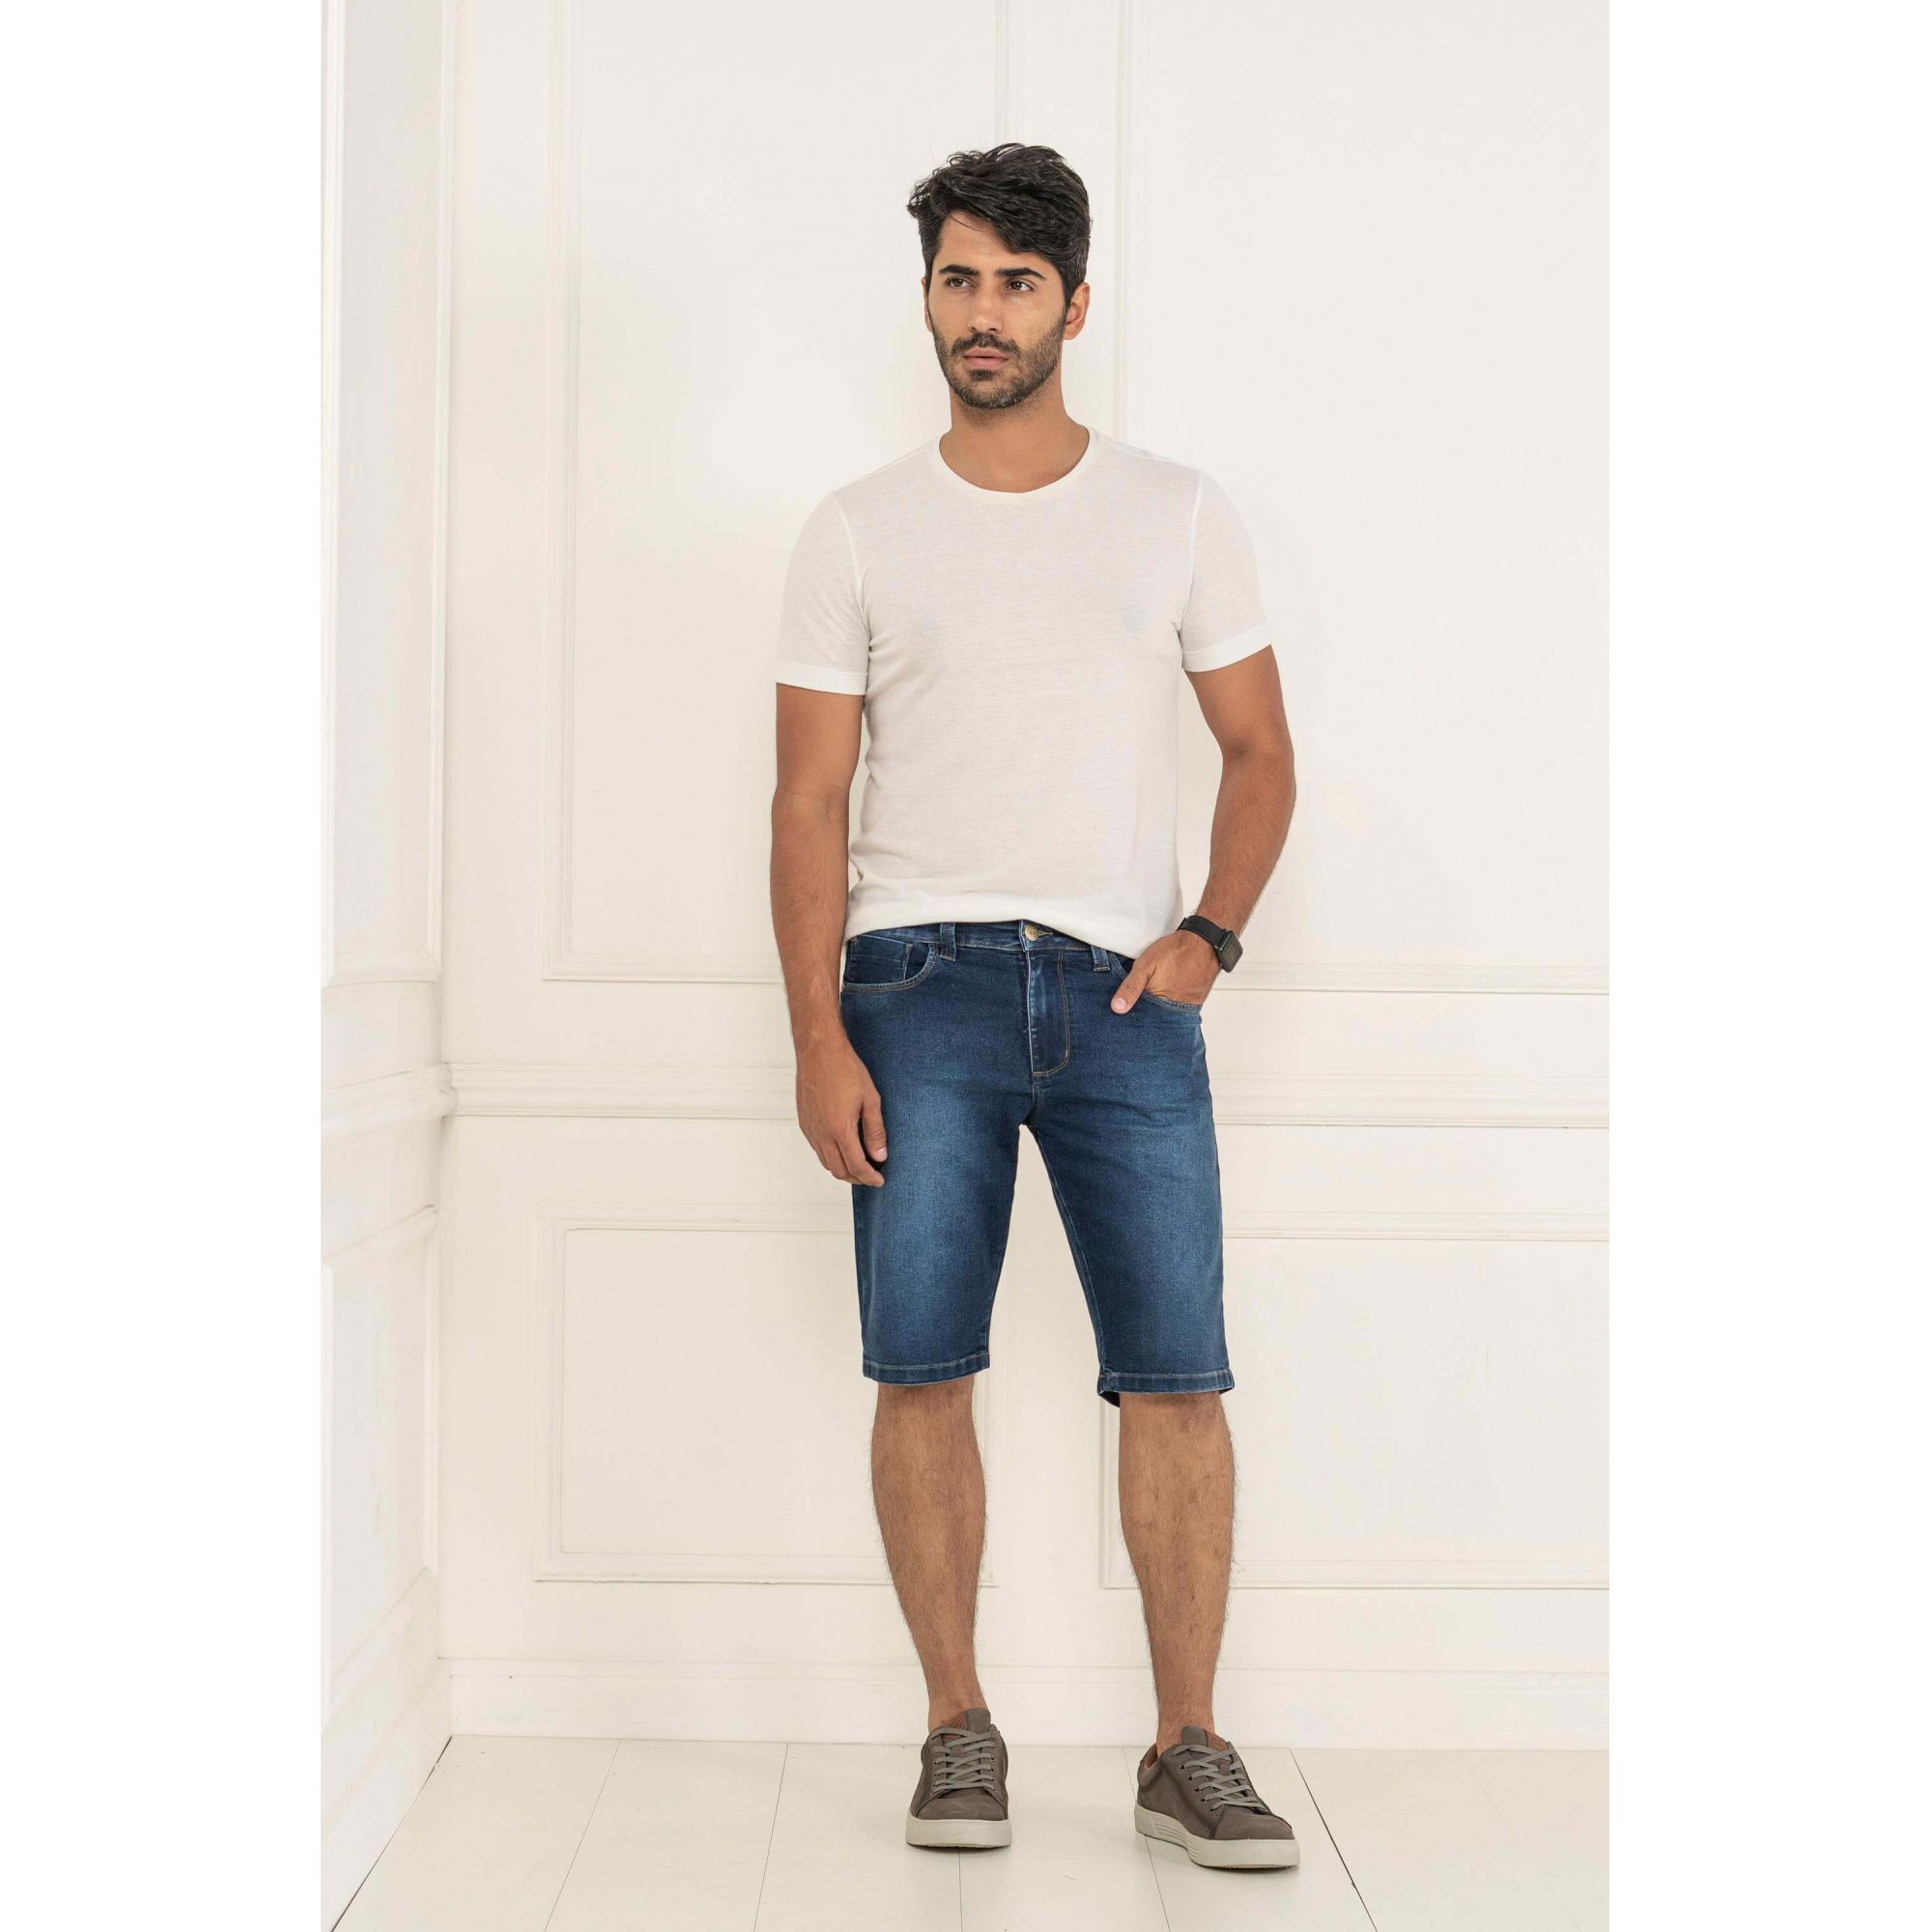 Bermuda Masculino Slim Lycra Jeans - KACOLAKO